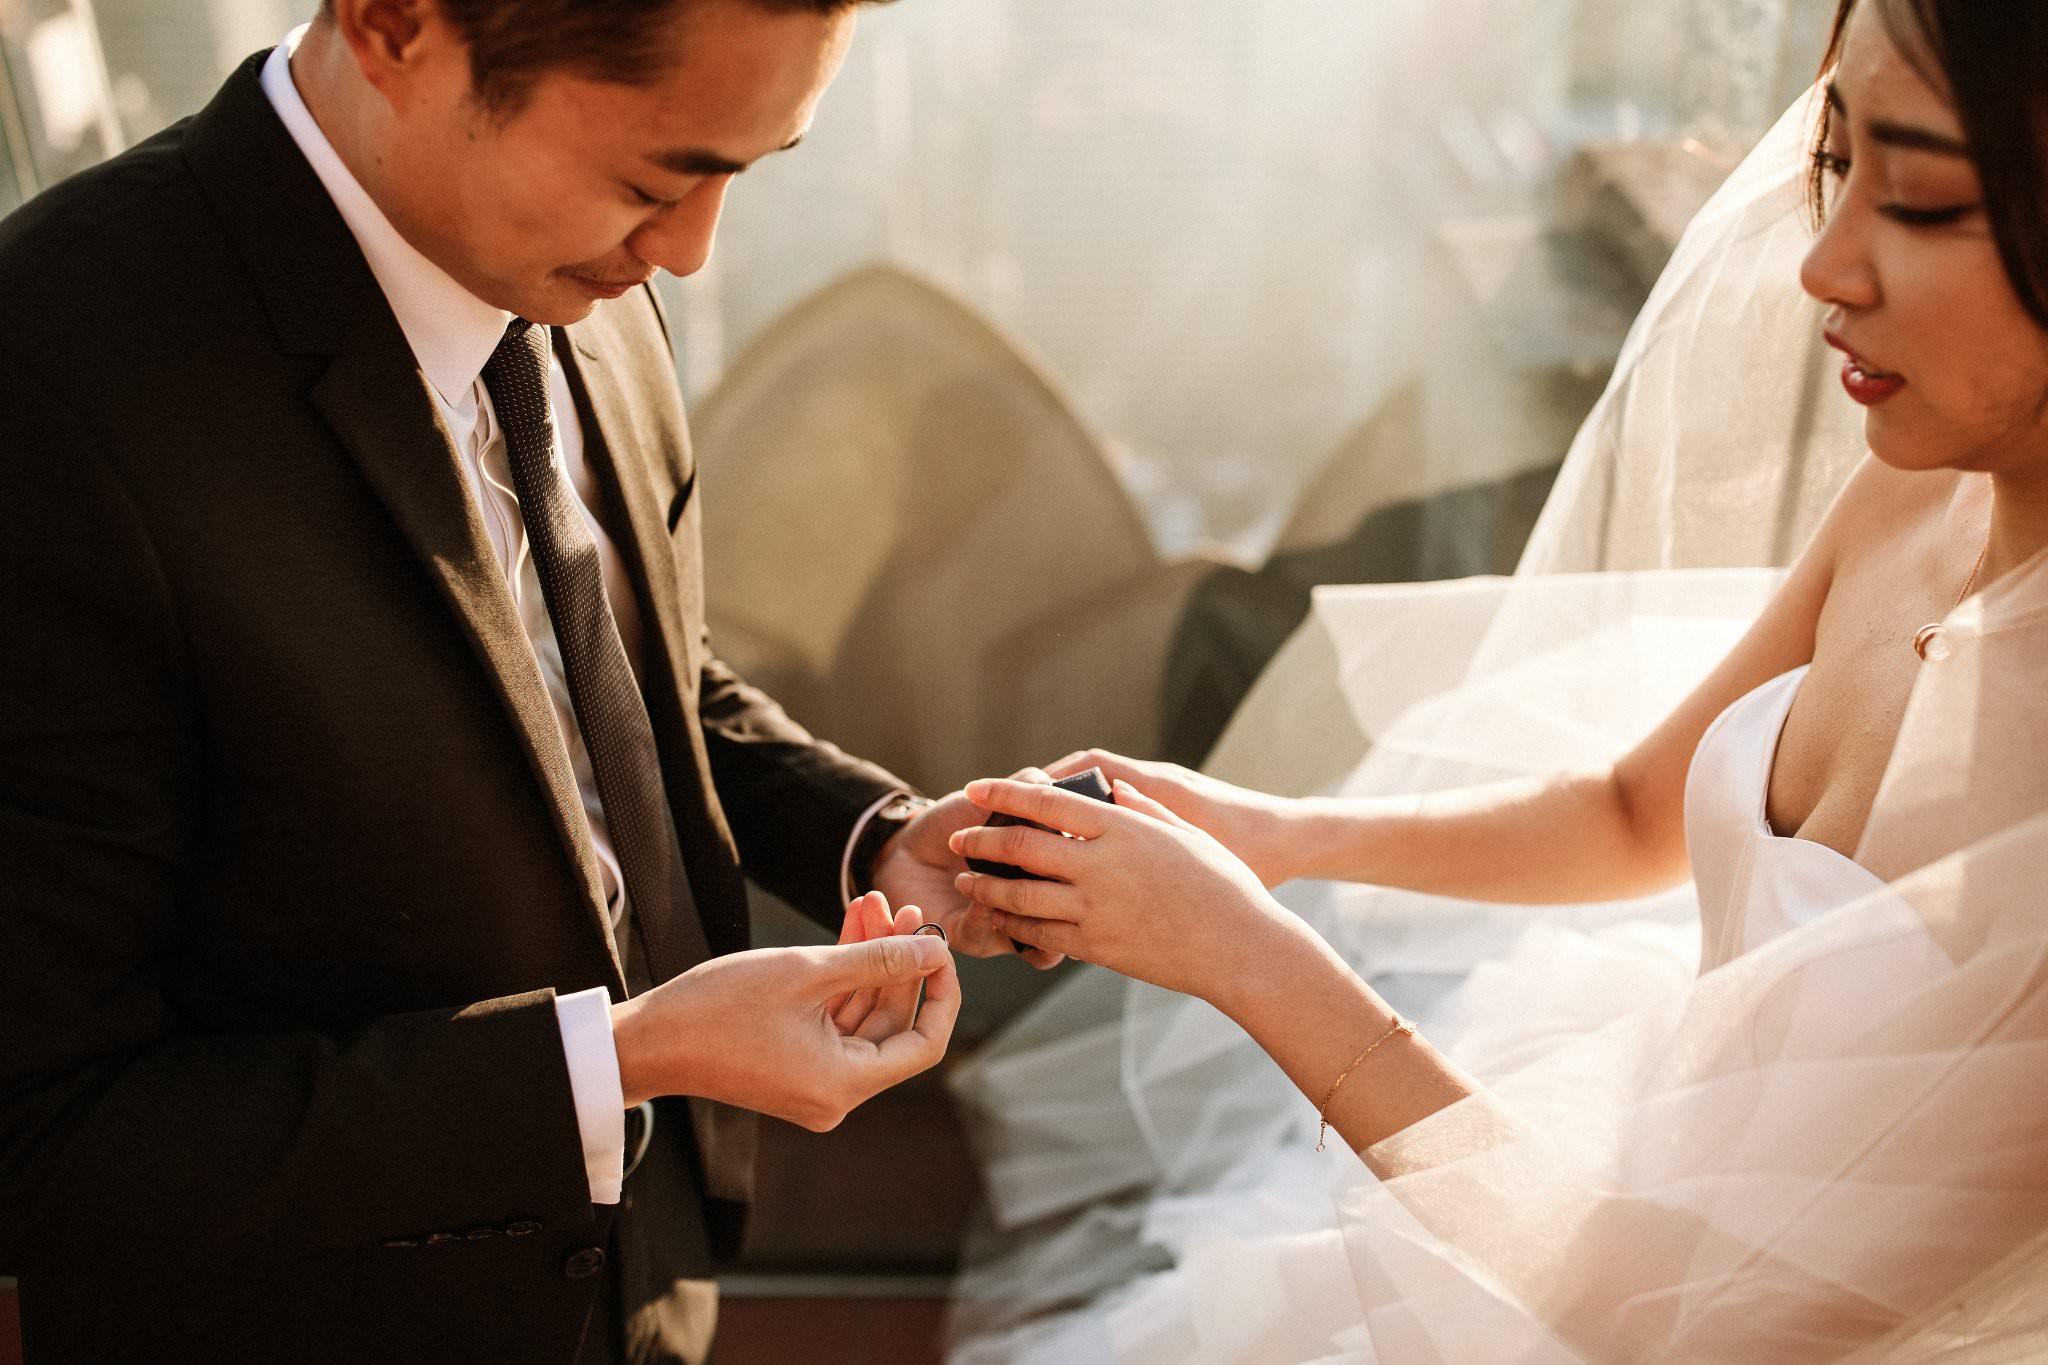 jose melgarejo brooklyn wedding photographer 15